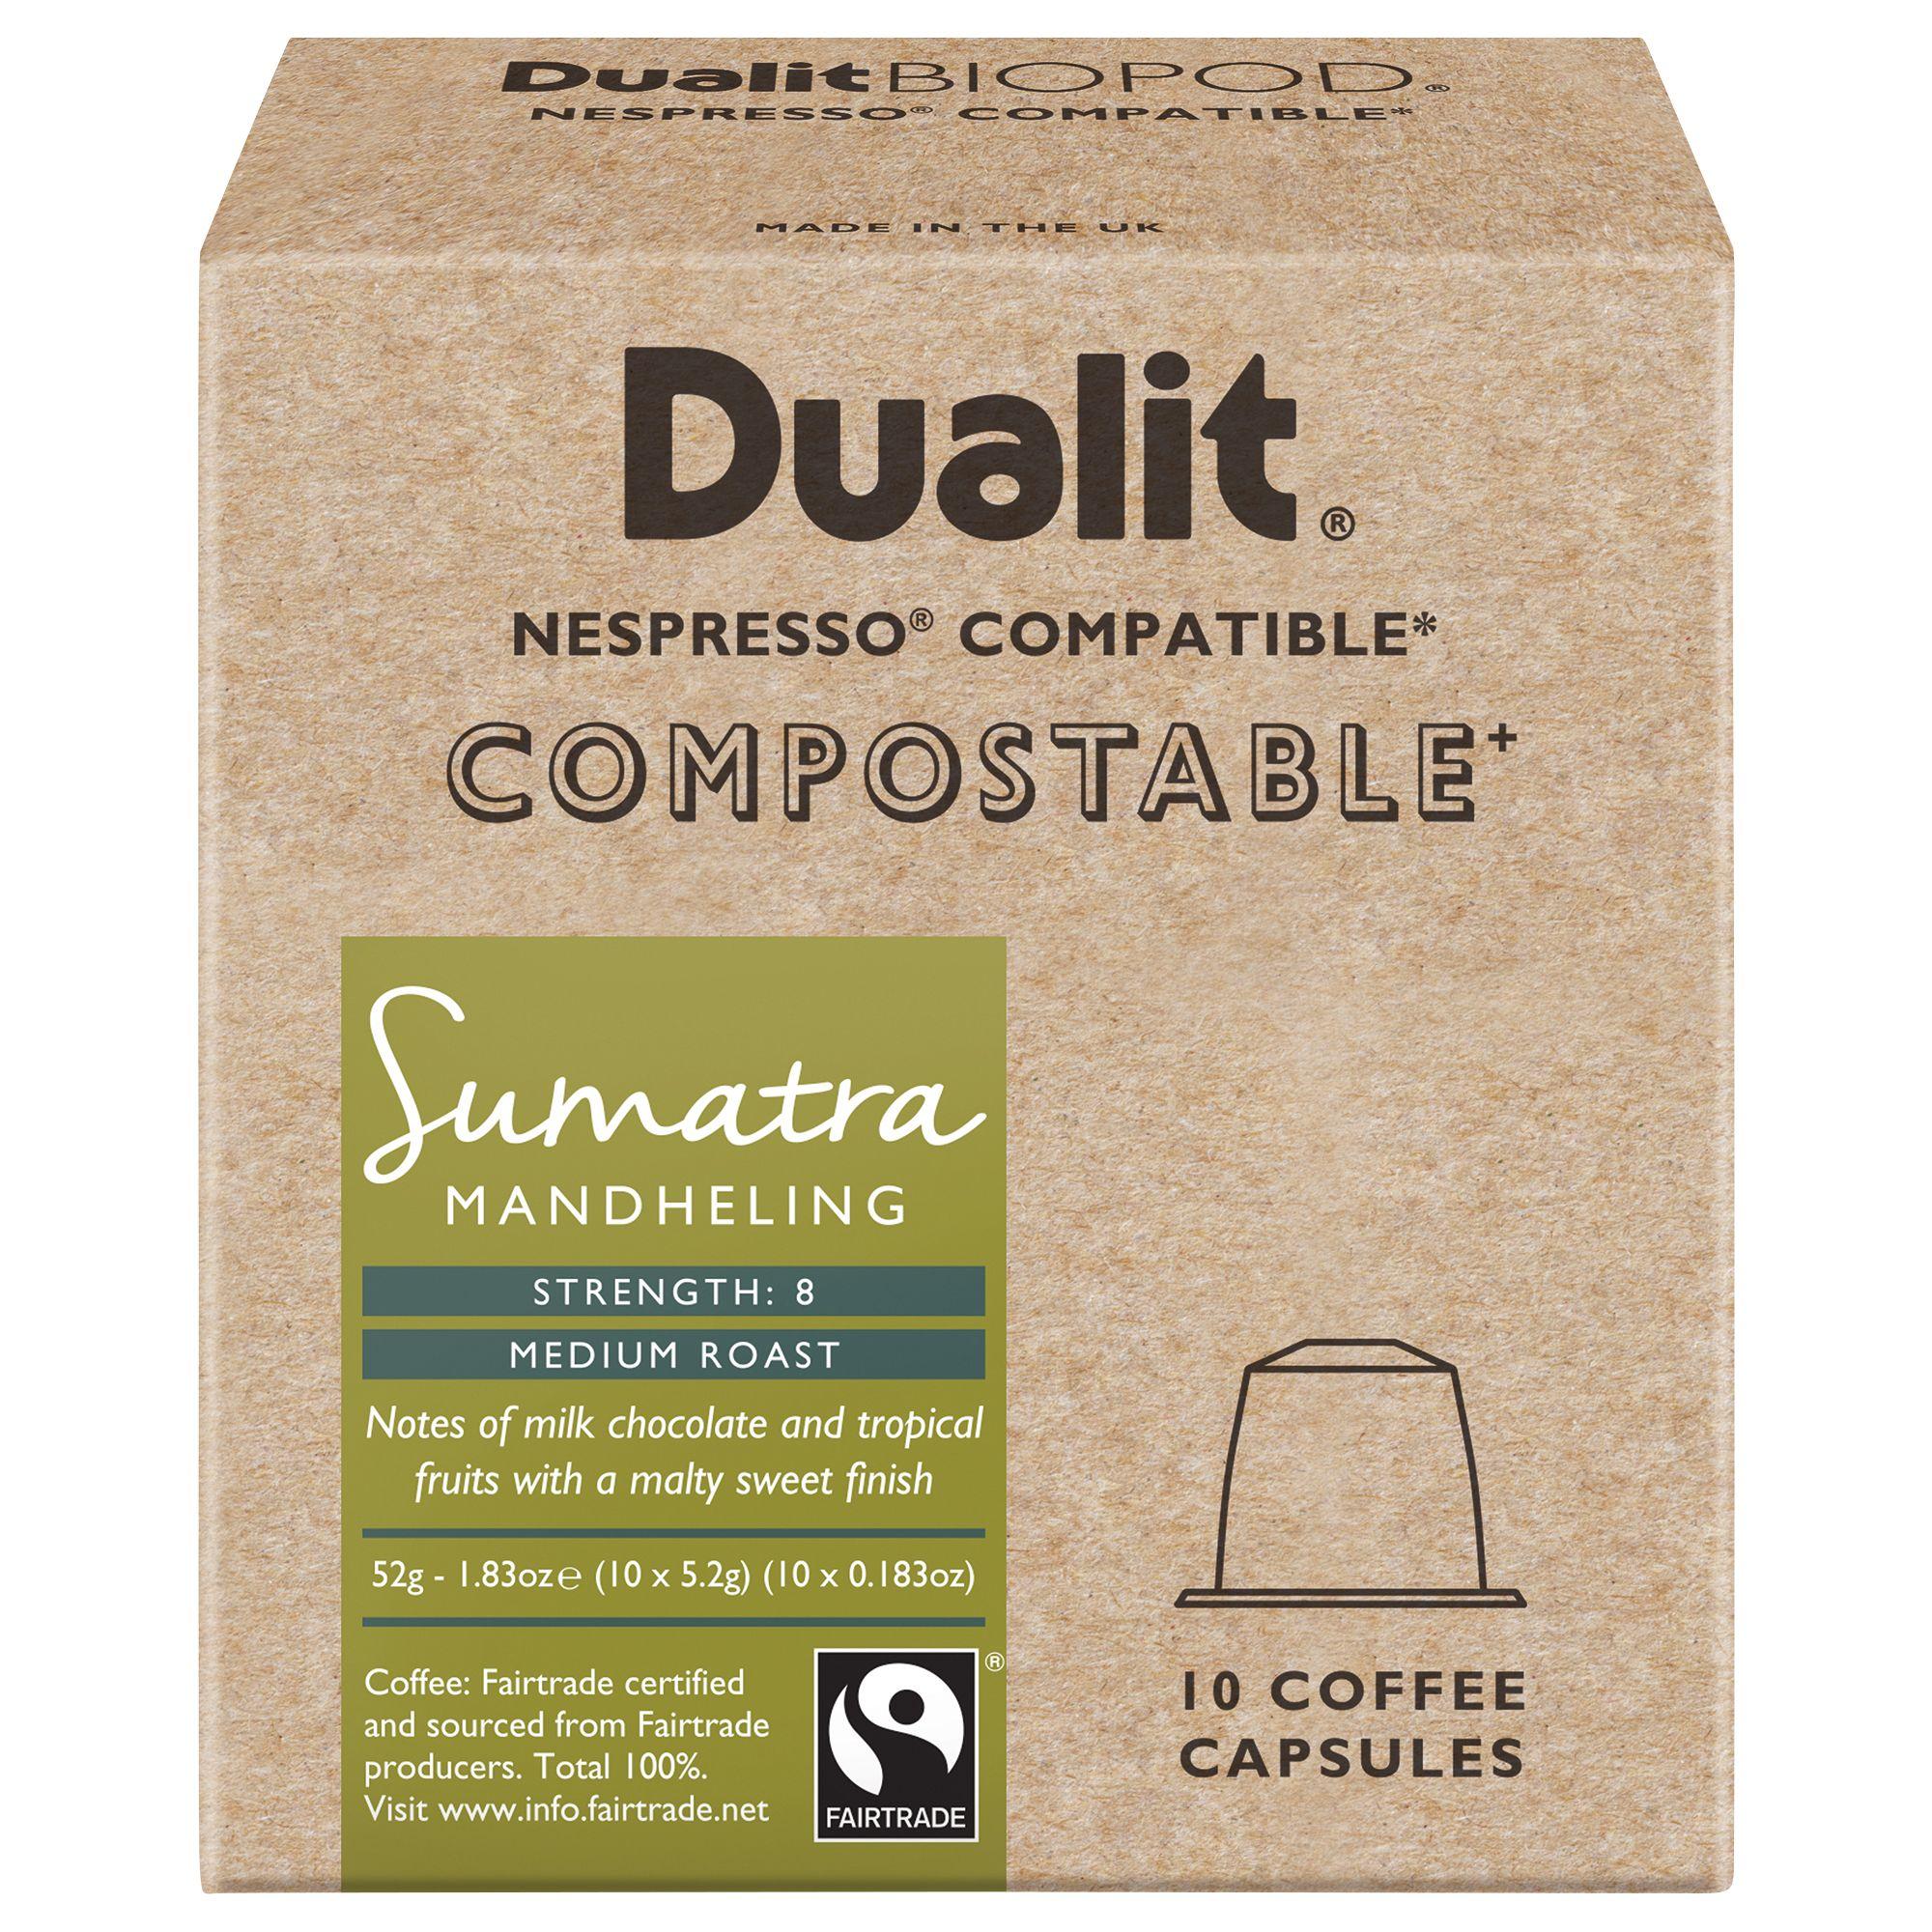 Dualit Compostable Sumatra Mandheling Coffee Capsules Pack